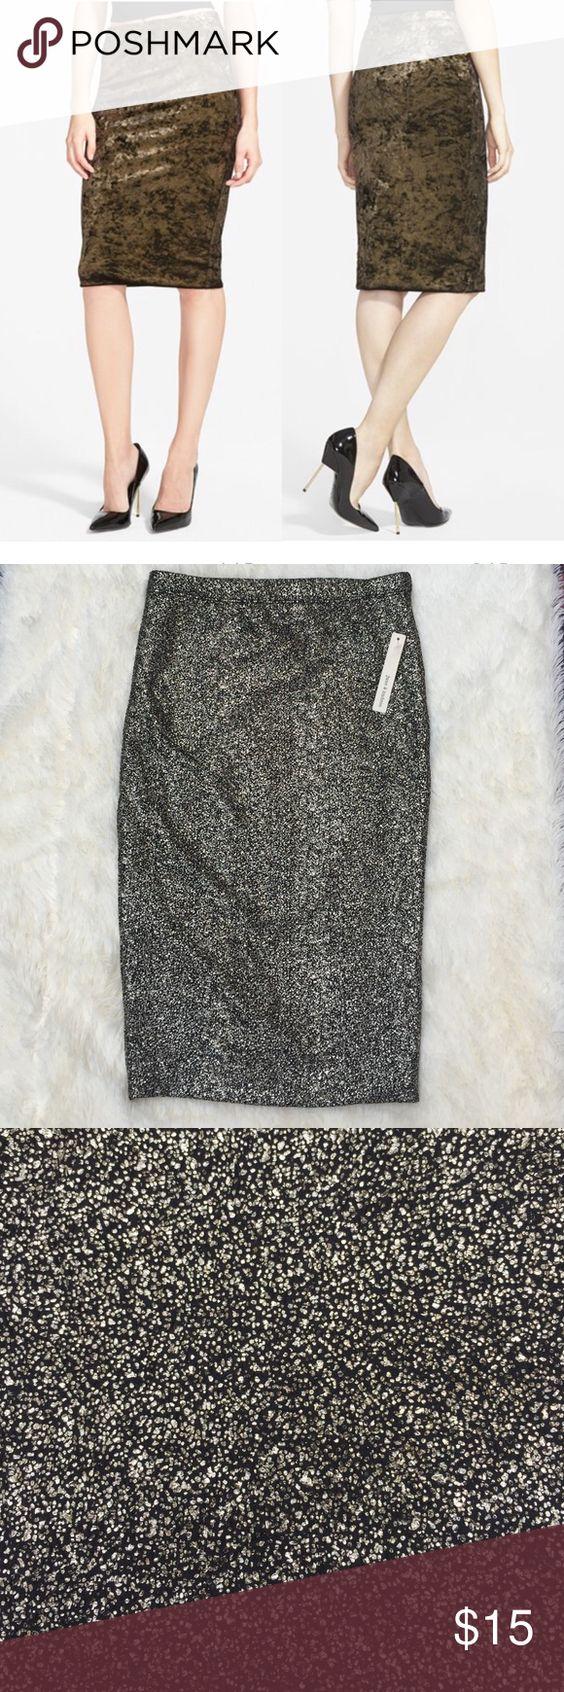 June & Hudson sparkly pencil skirt. NWT June & Hudson mettalic gold pencil skirt. XS June & Hudson Skirts Pencil